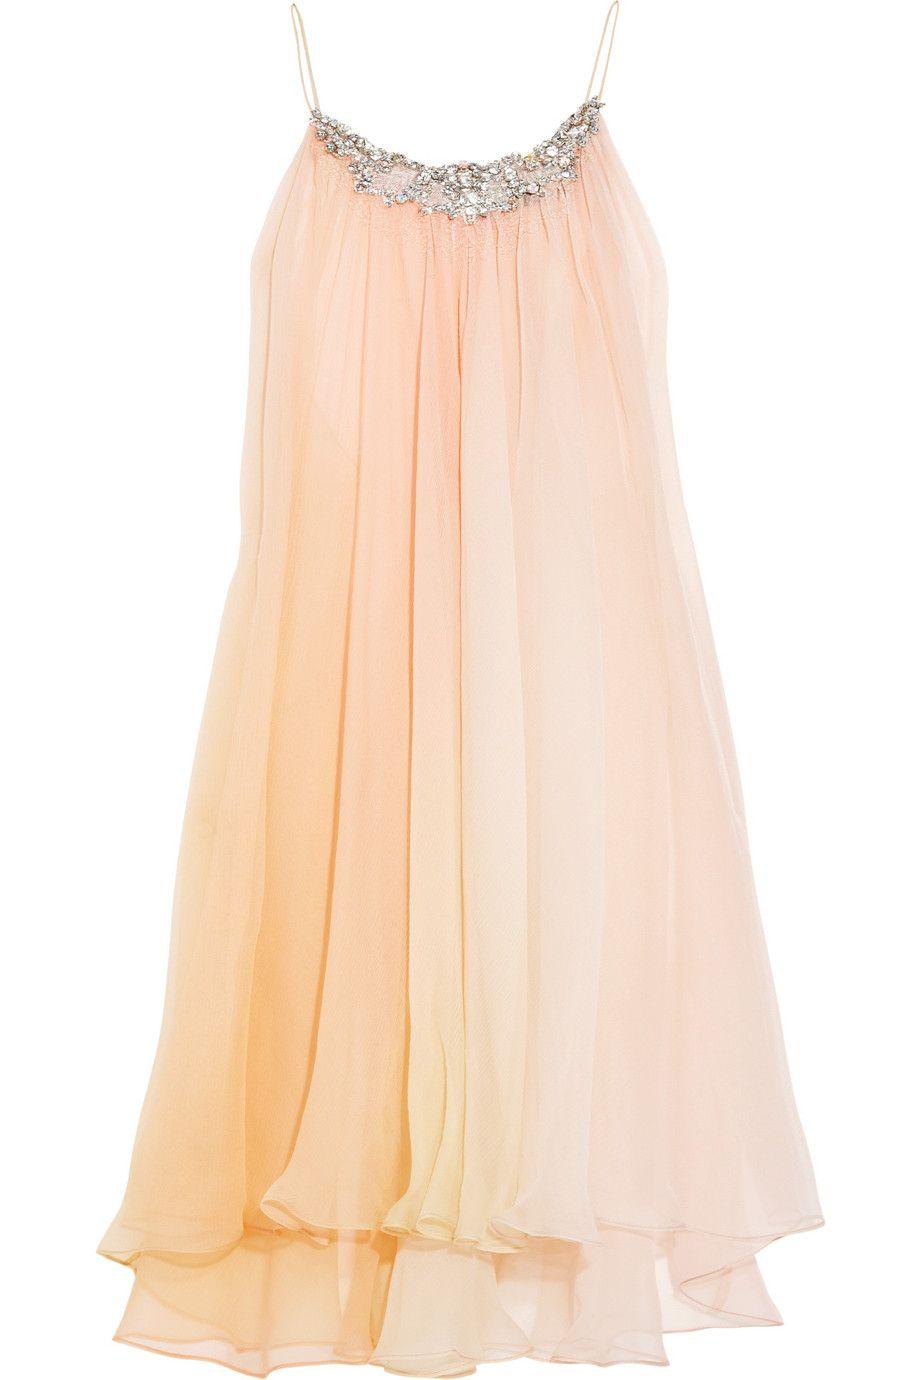 Jenny packham handpainted silkchiffon chemise spotted on wedding